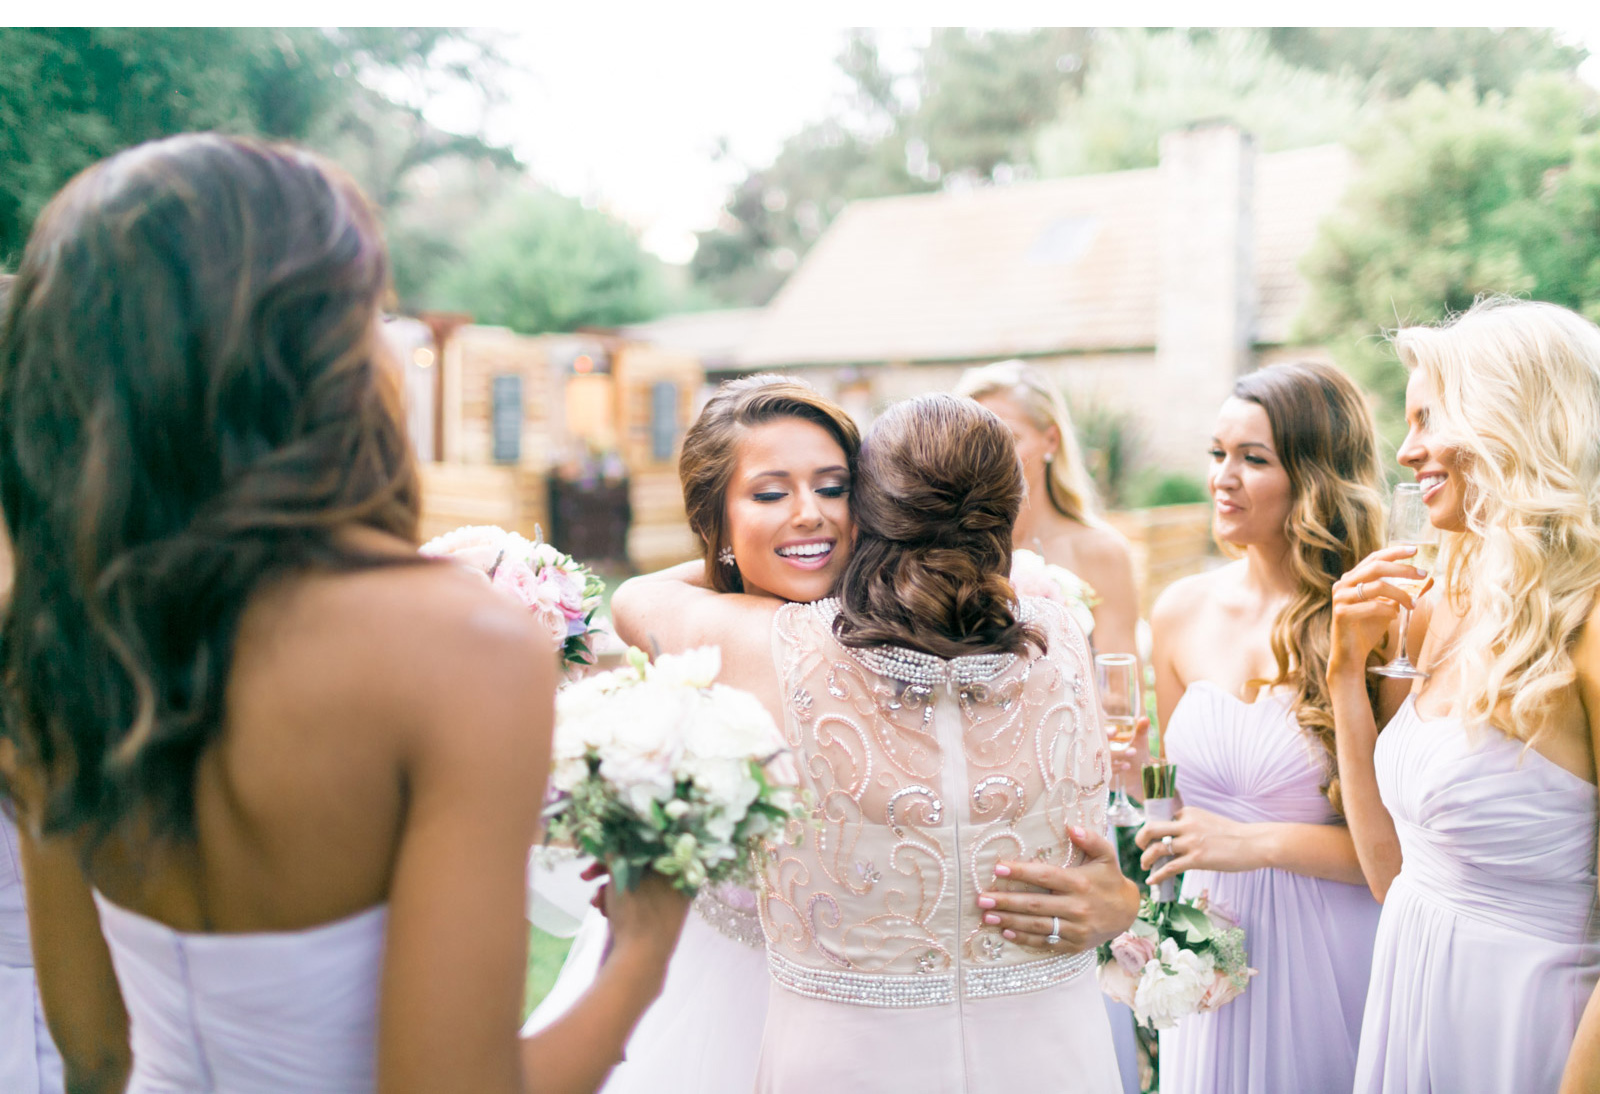 Nia-Sanchez-Miss-USA-Temecula-Wedding-Natalie-Schutt-Photography_09.jpg